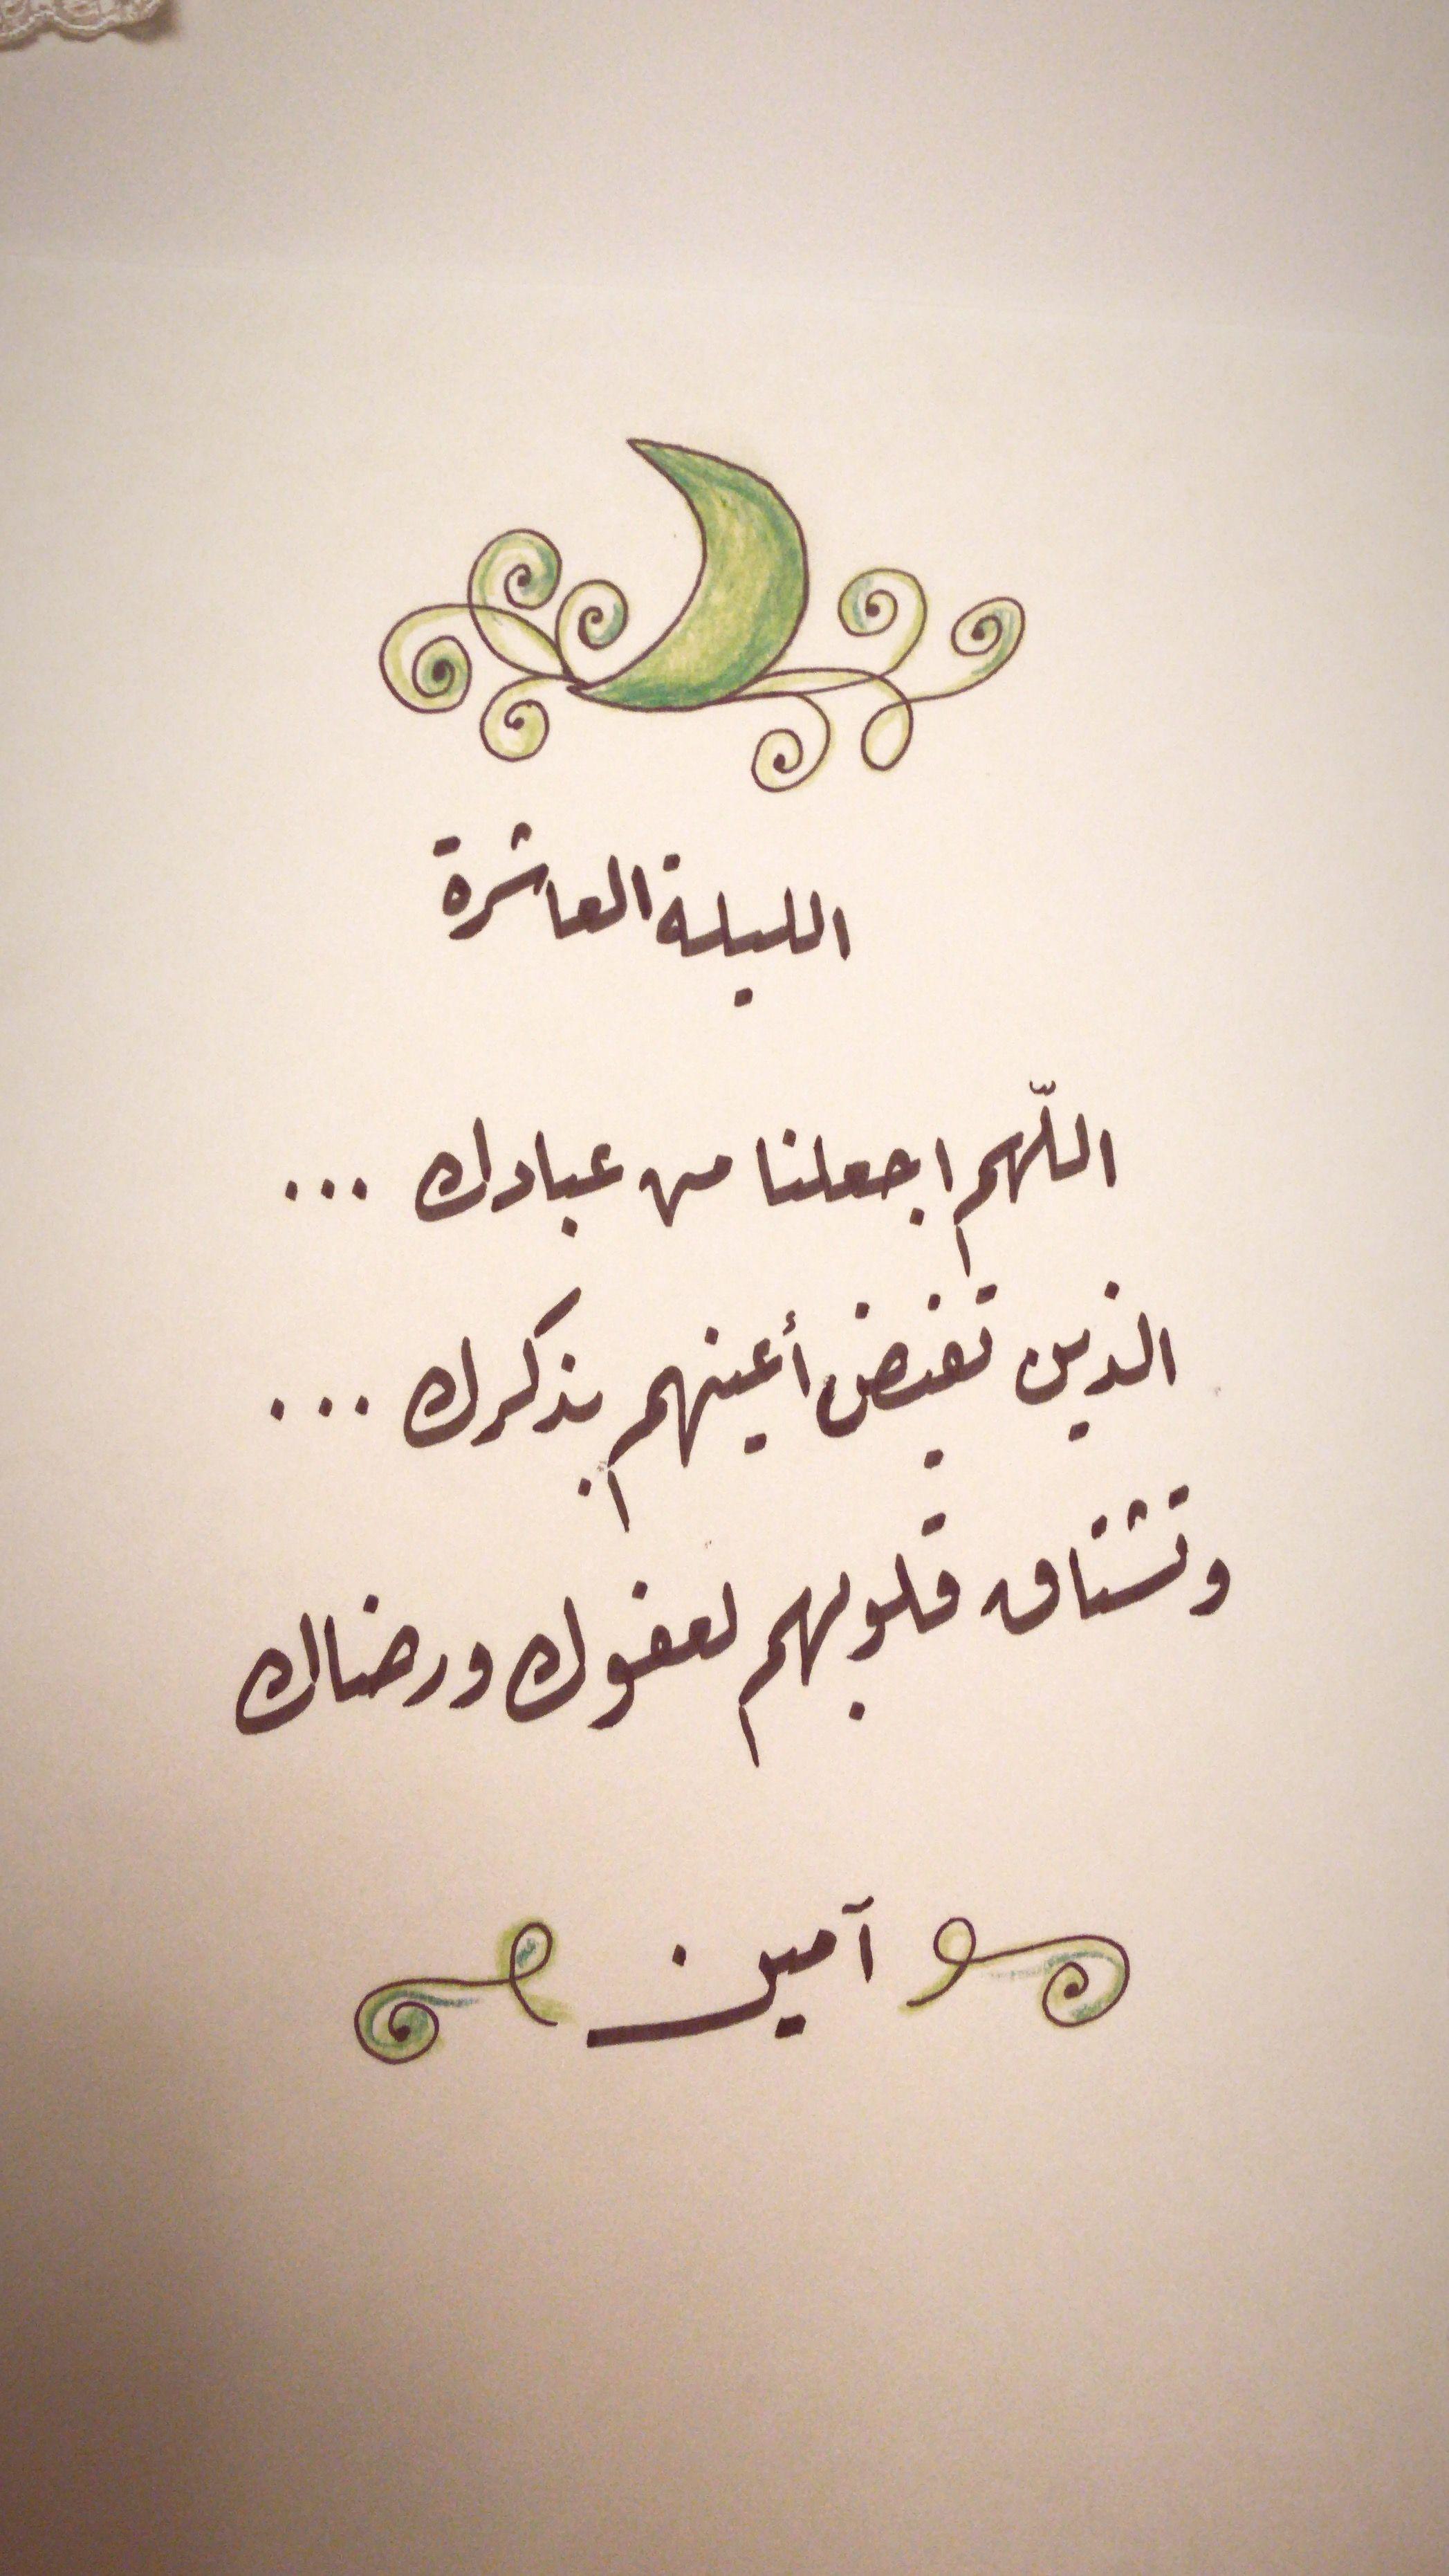 دعاء رمضان خربشات رسم خط خطي رقعة Arabic Calligraphy Calligraphy Crafts